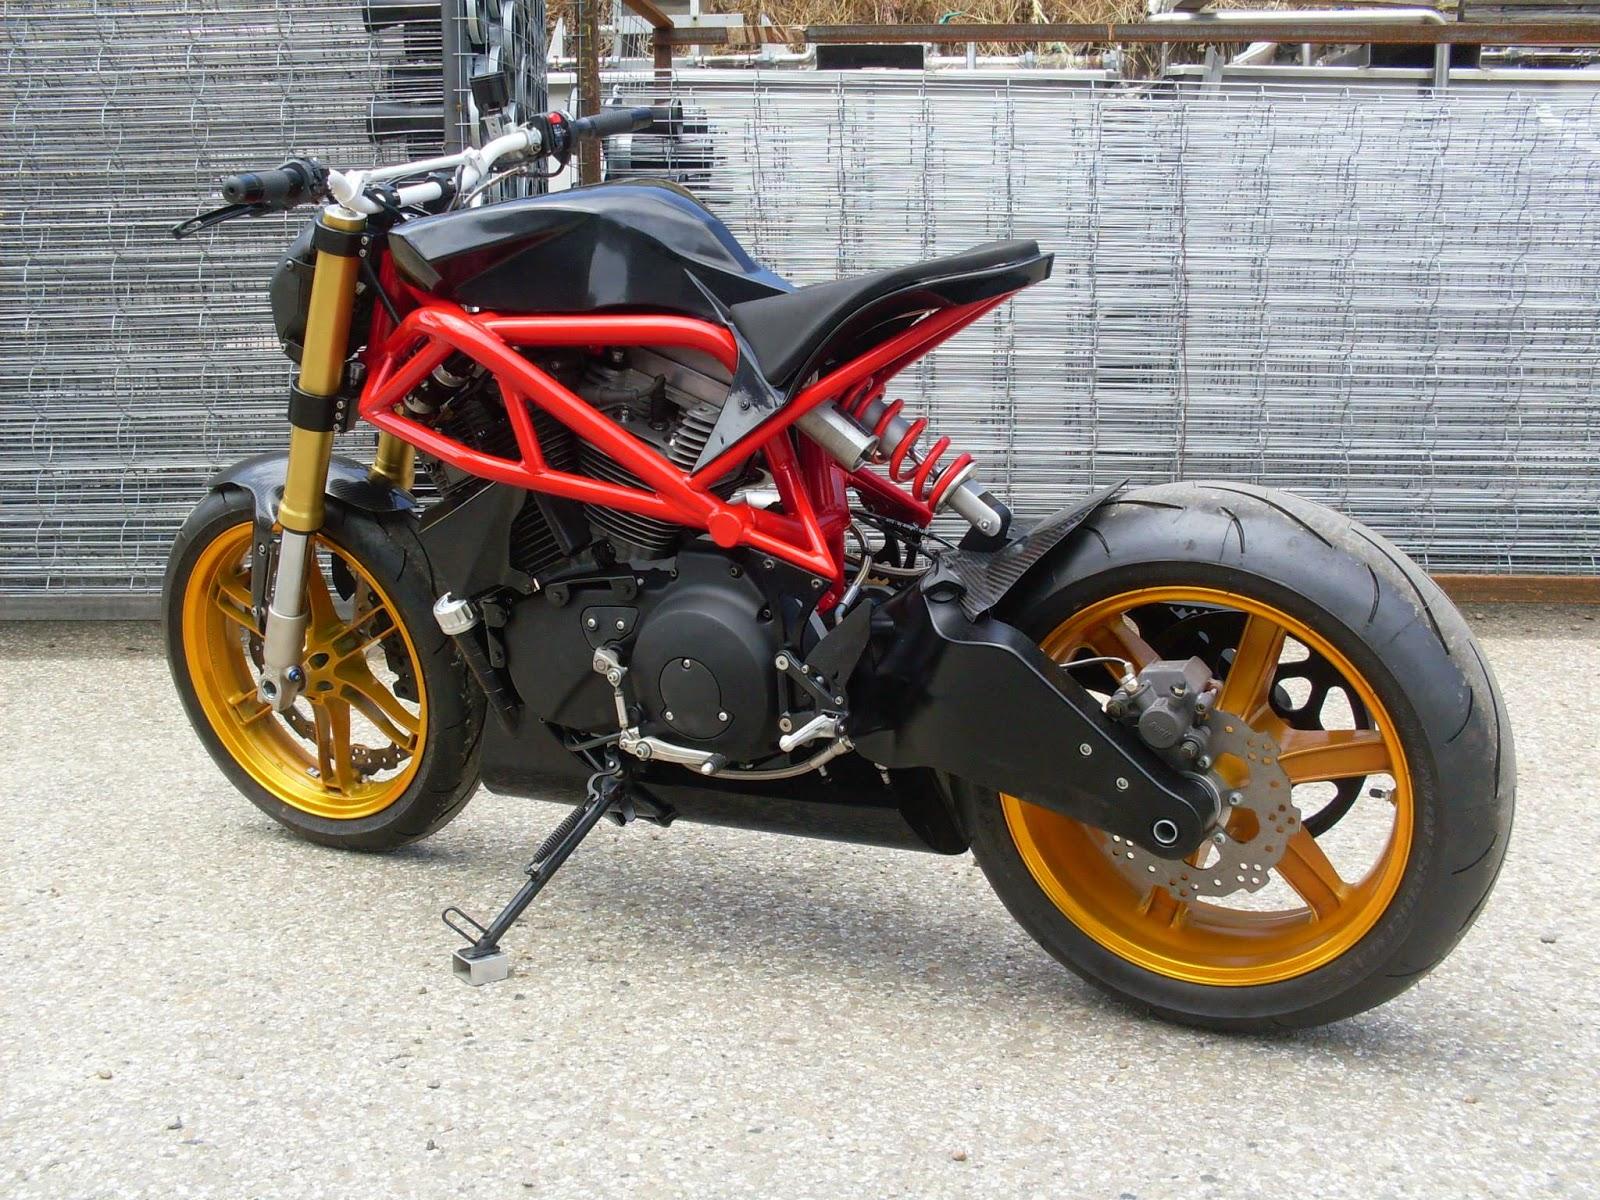 Buell XB 1200 Cafe Racer